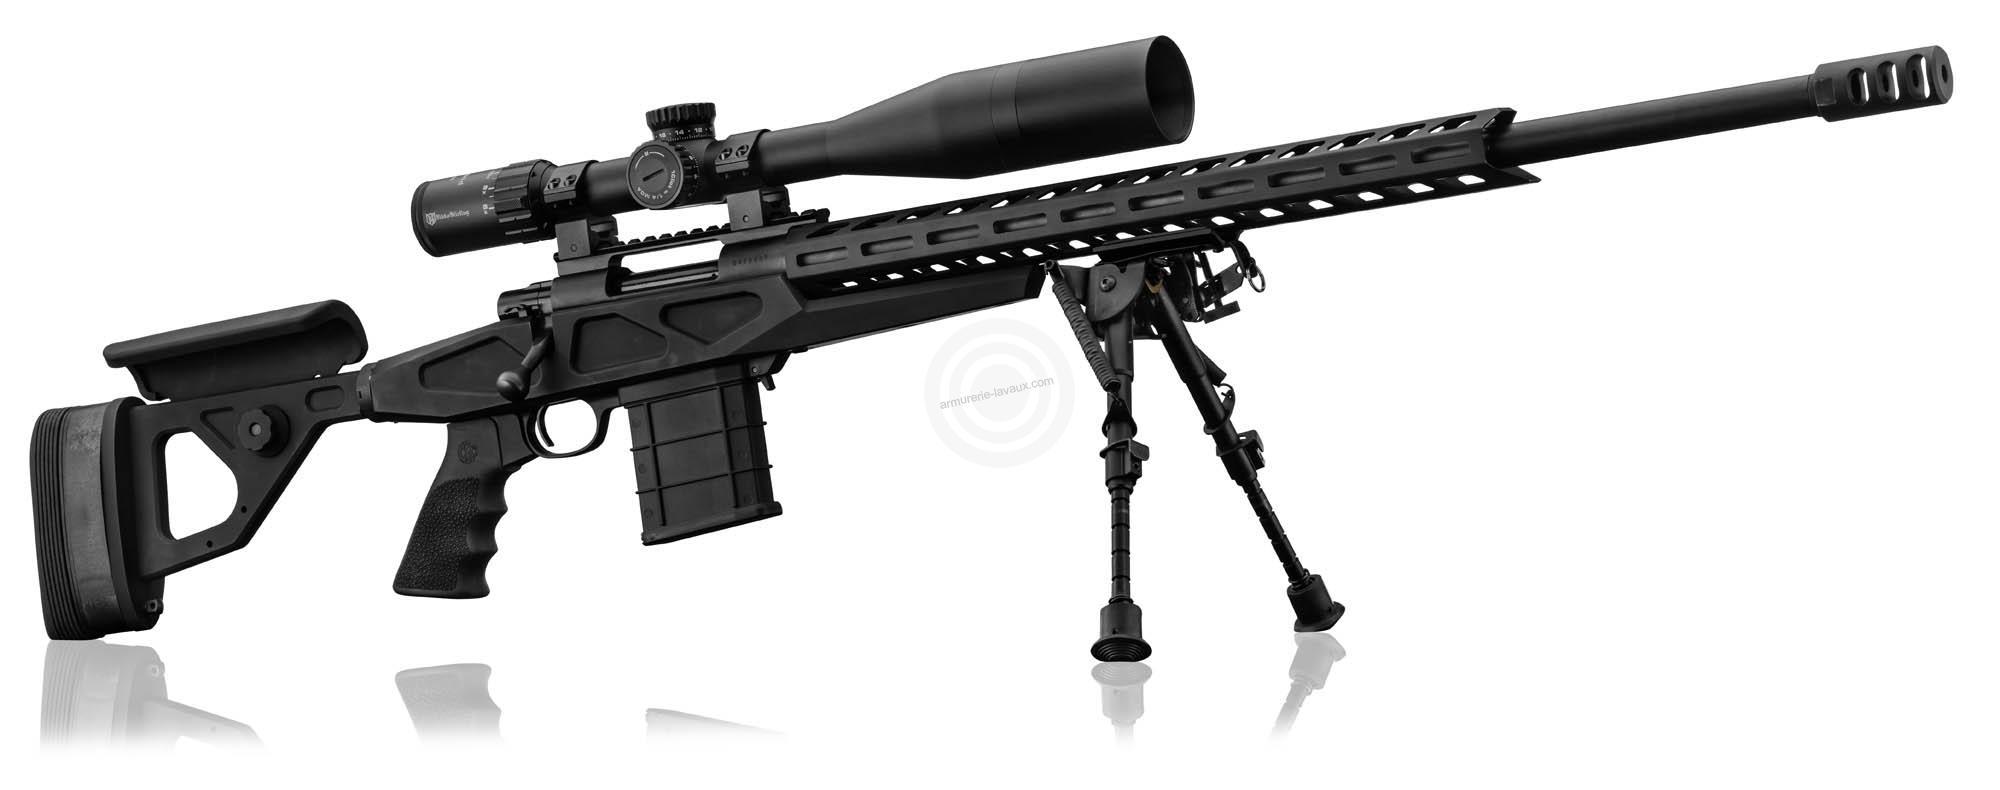 Choix carabine verrou en 308 HOBP01_4